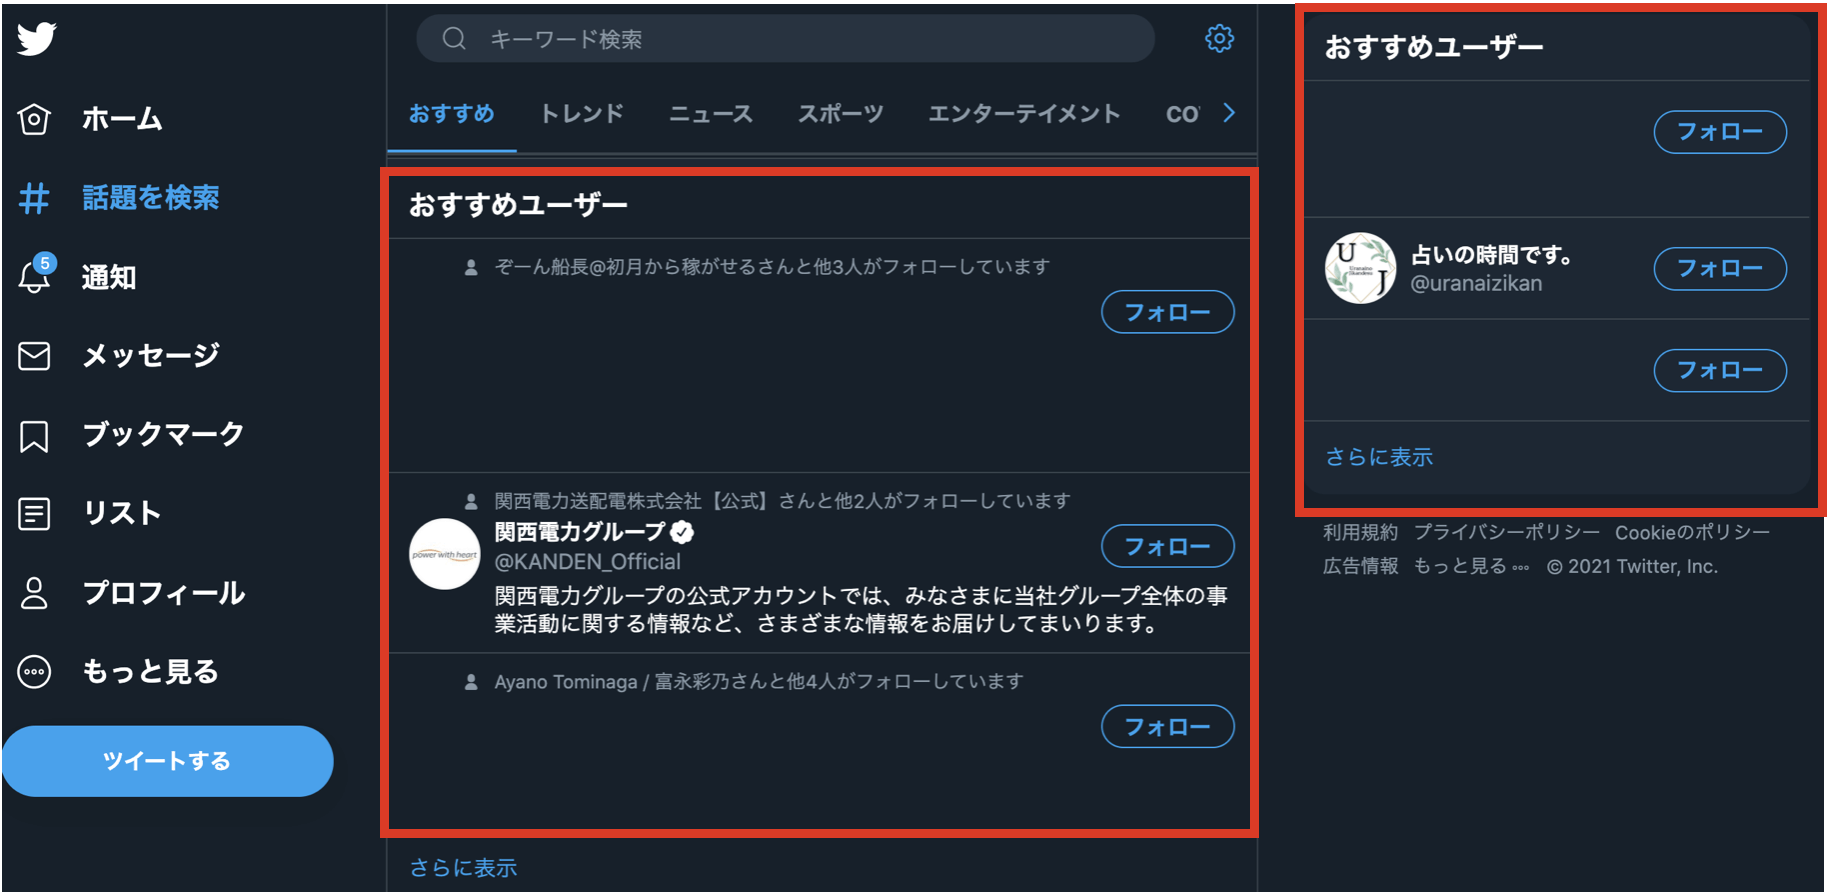 Twitter おすすめユーザー 例